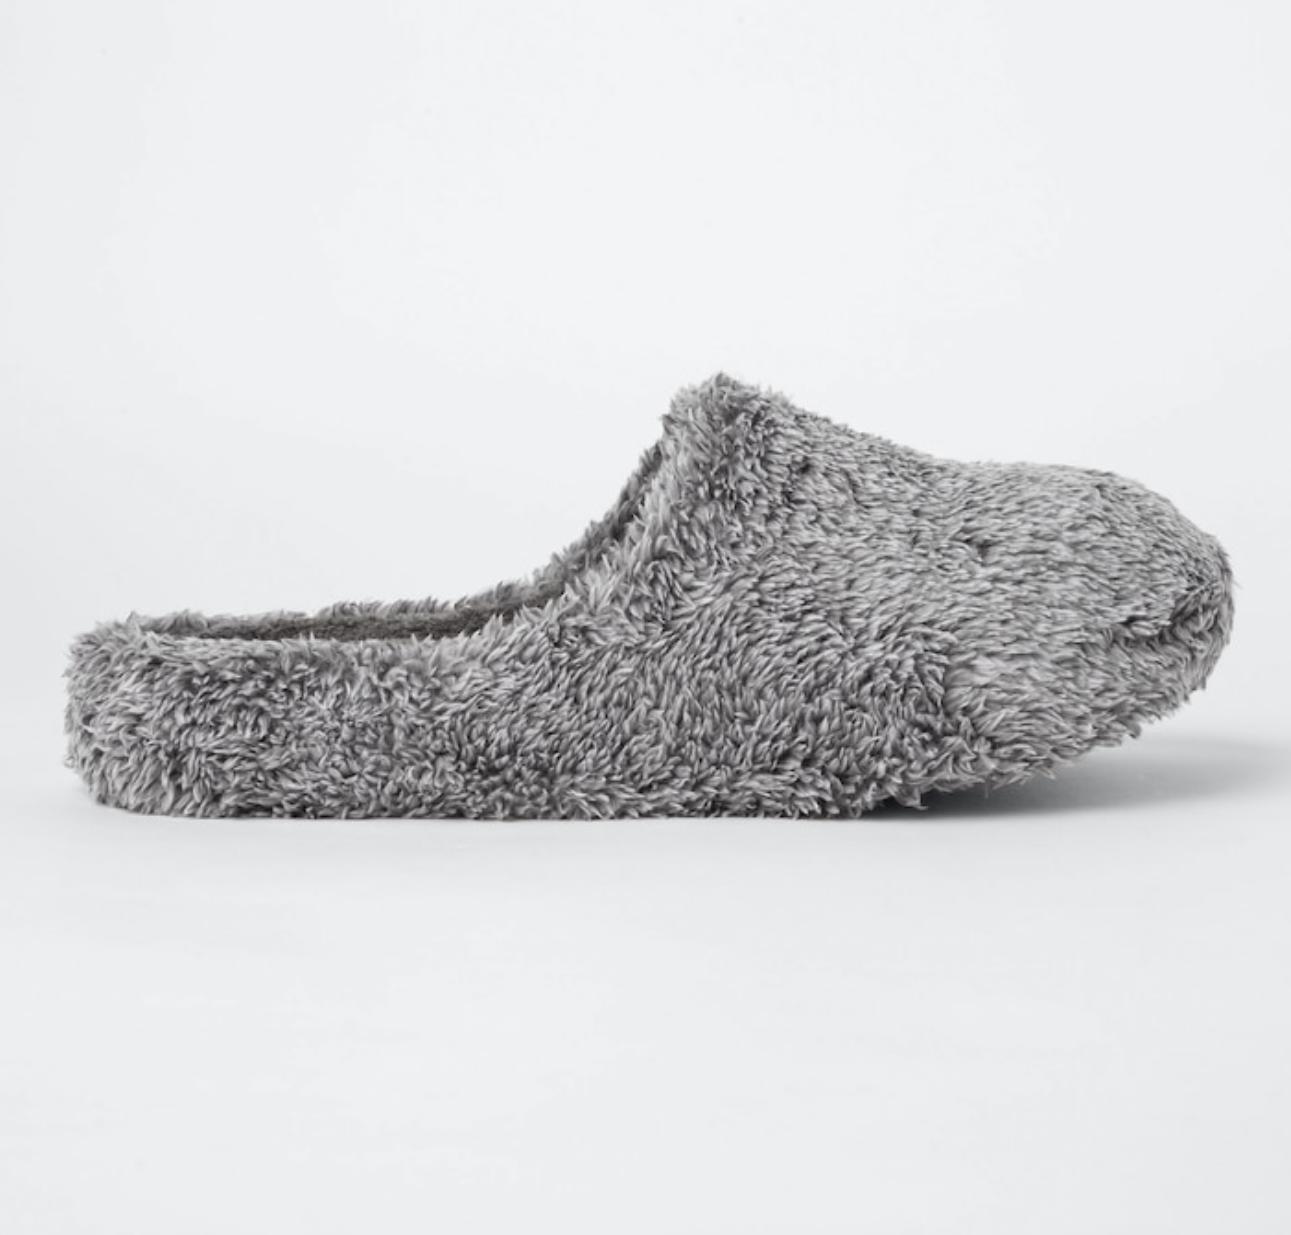 Uniqlo Fluffy Yarn Fleece Slippers